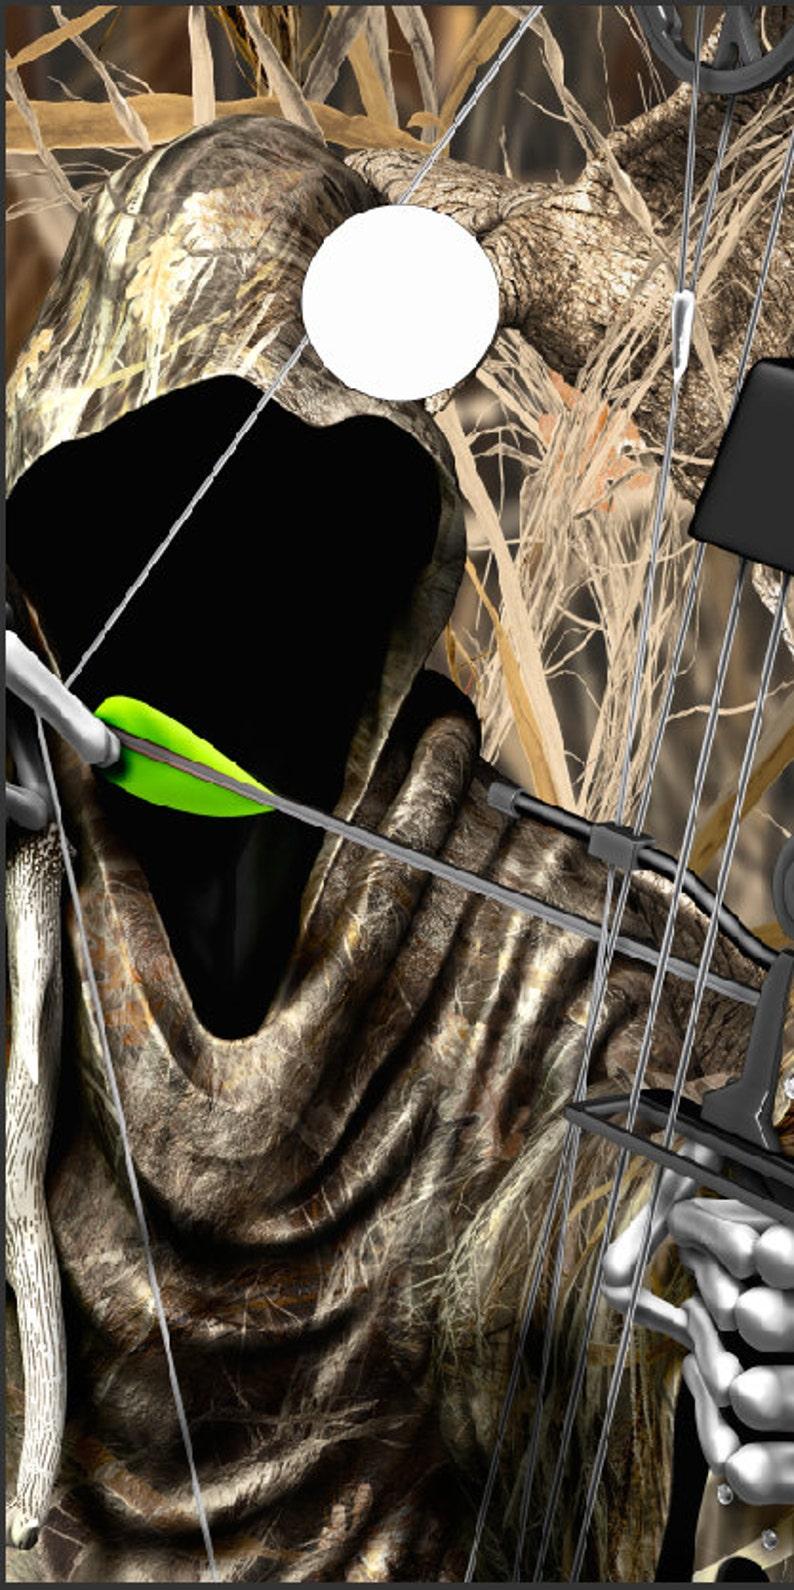 Bow Reaper Tallgrass Duck Camo Cornhole Wrap Bag Toss Decal Baggo Skin Sticker Wraps